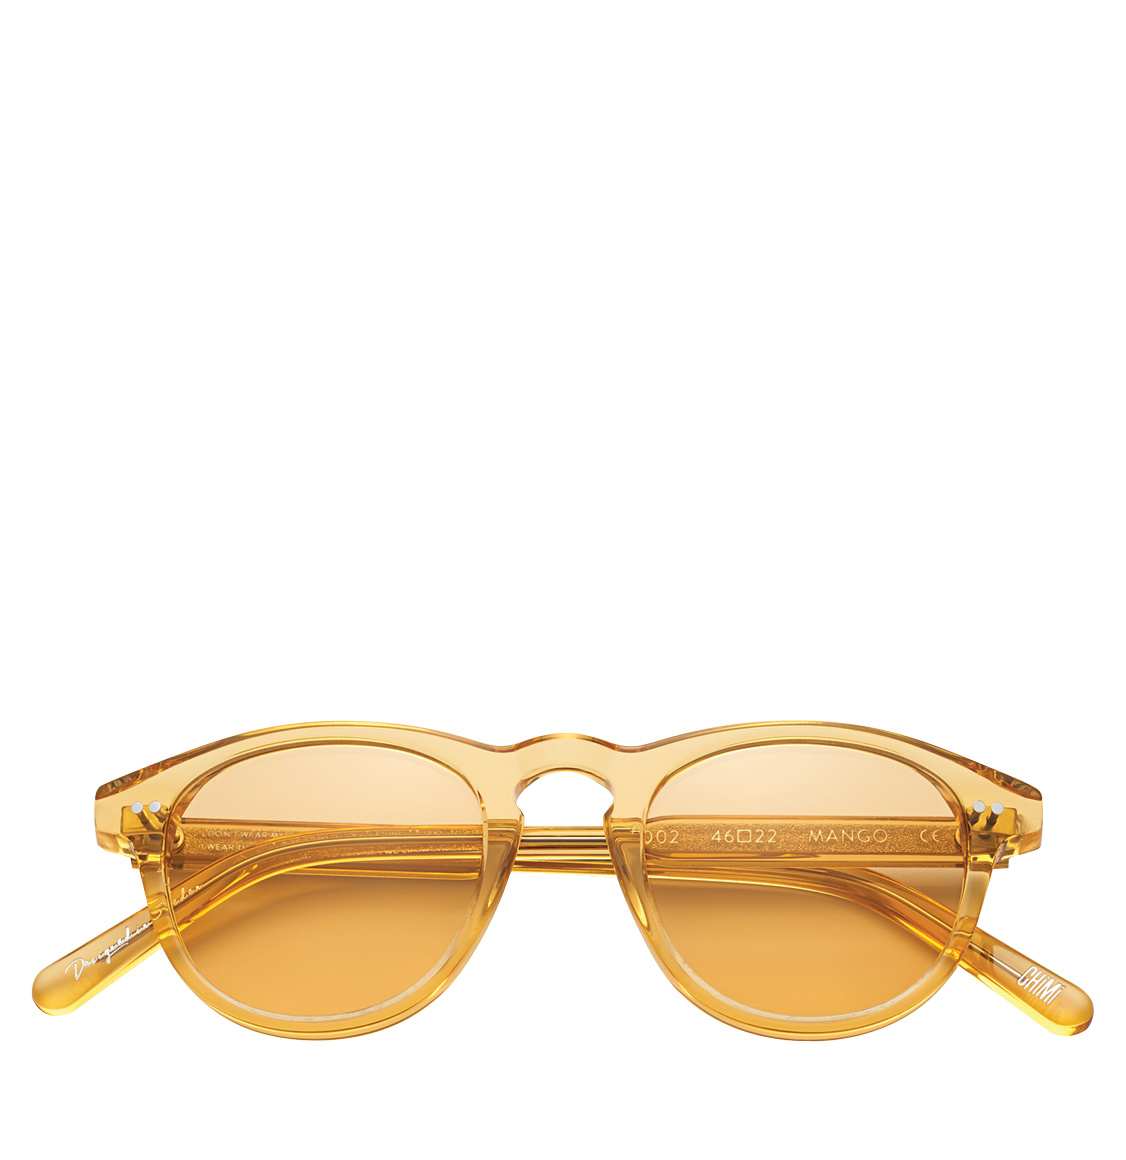 Chimi 002 Round Frame Mango Clear Γυαλιά Ηλίου